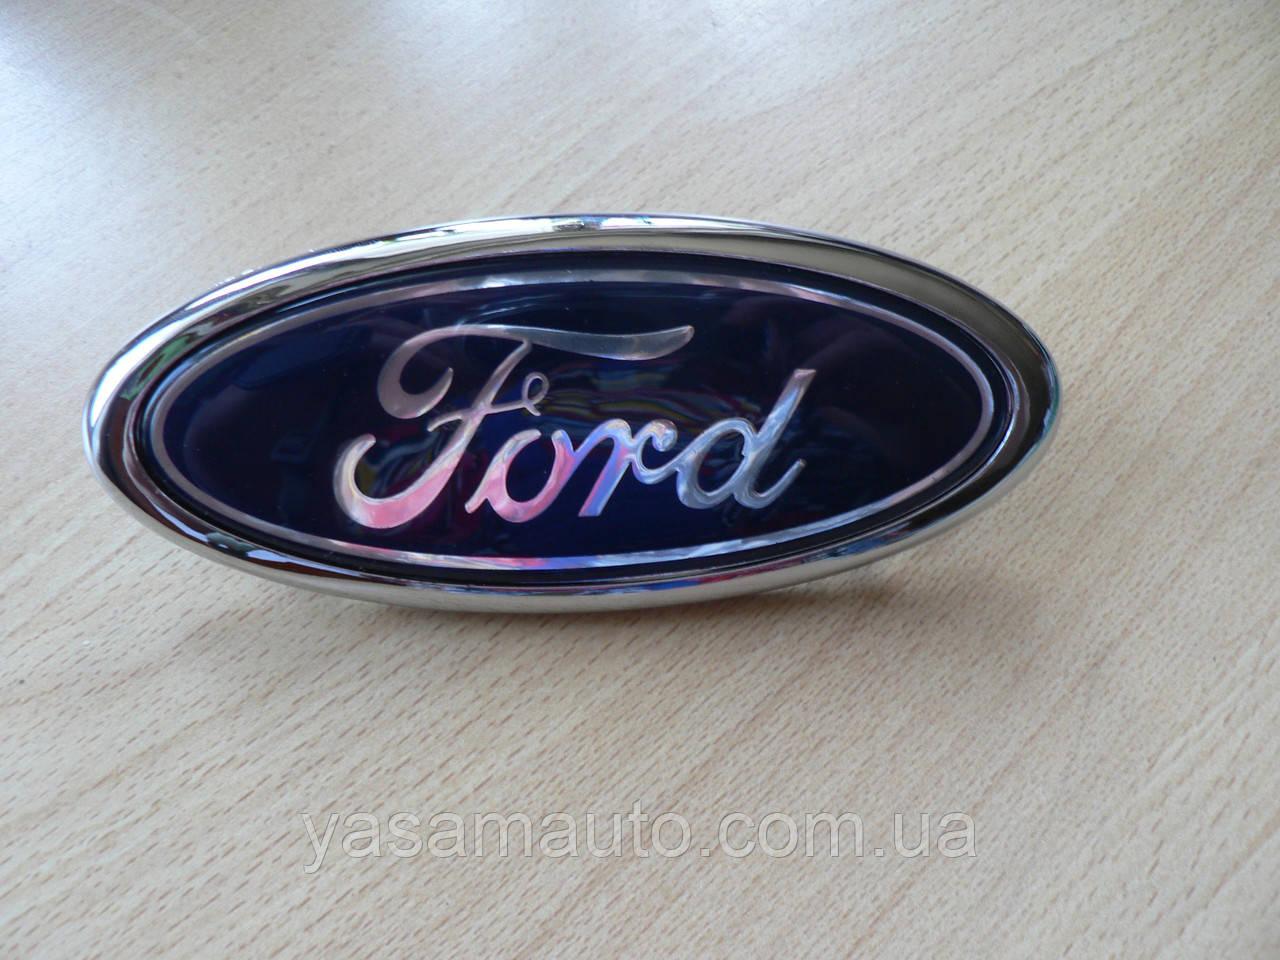 Эмблема z Ford 146х58.4х9.5мм пластиковая Connect наклейка на авто Форд Коннект посадка скотч и 3 штыря задняя